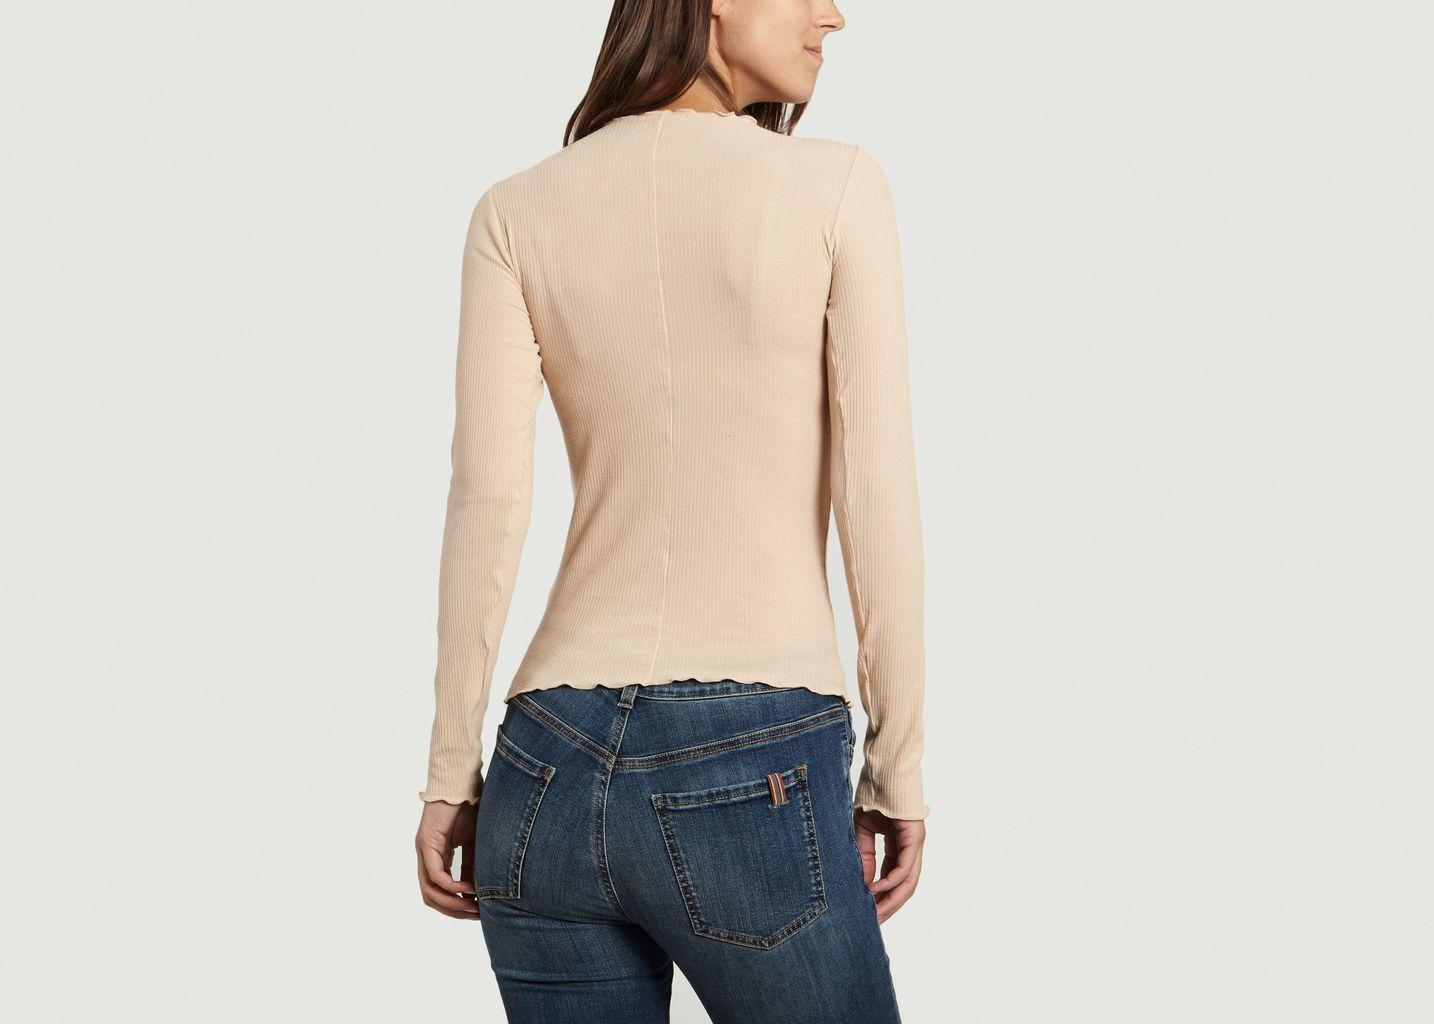 T-shirt Manches Longues Lege - Baserange